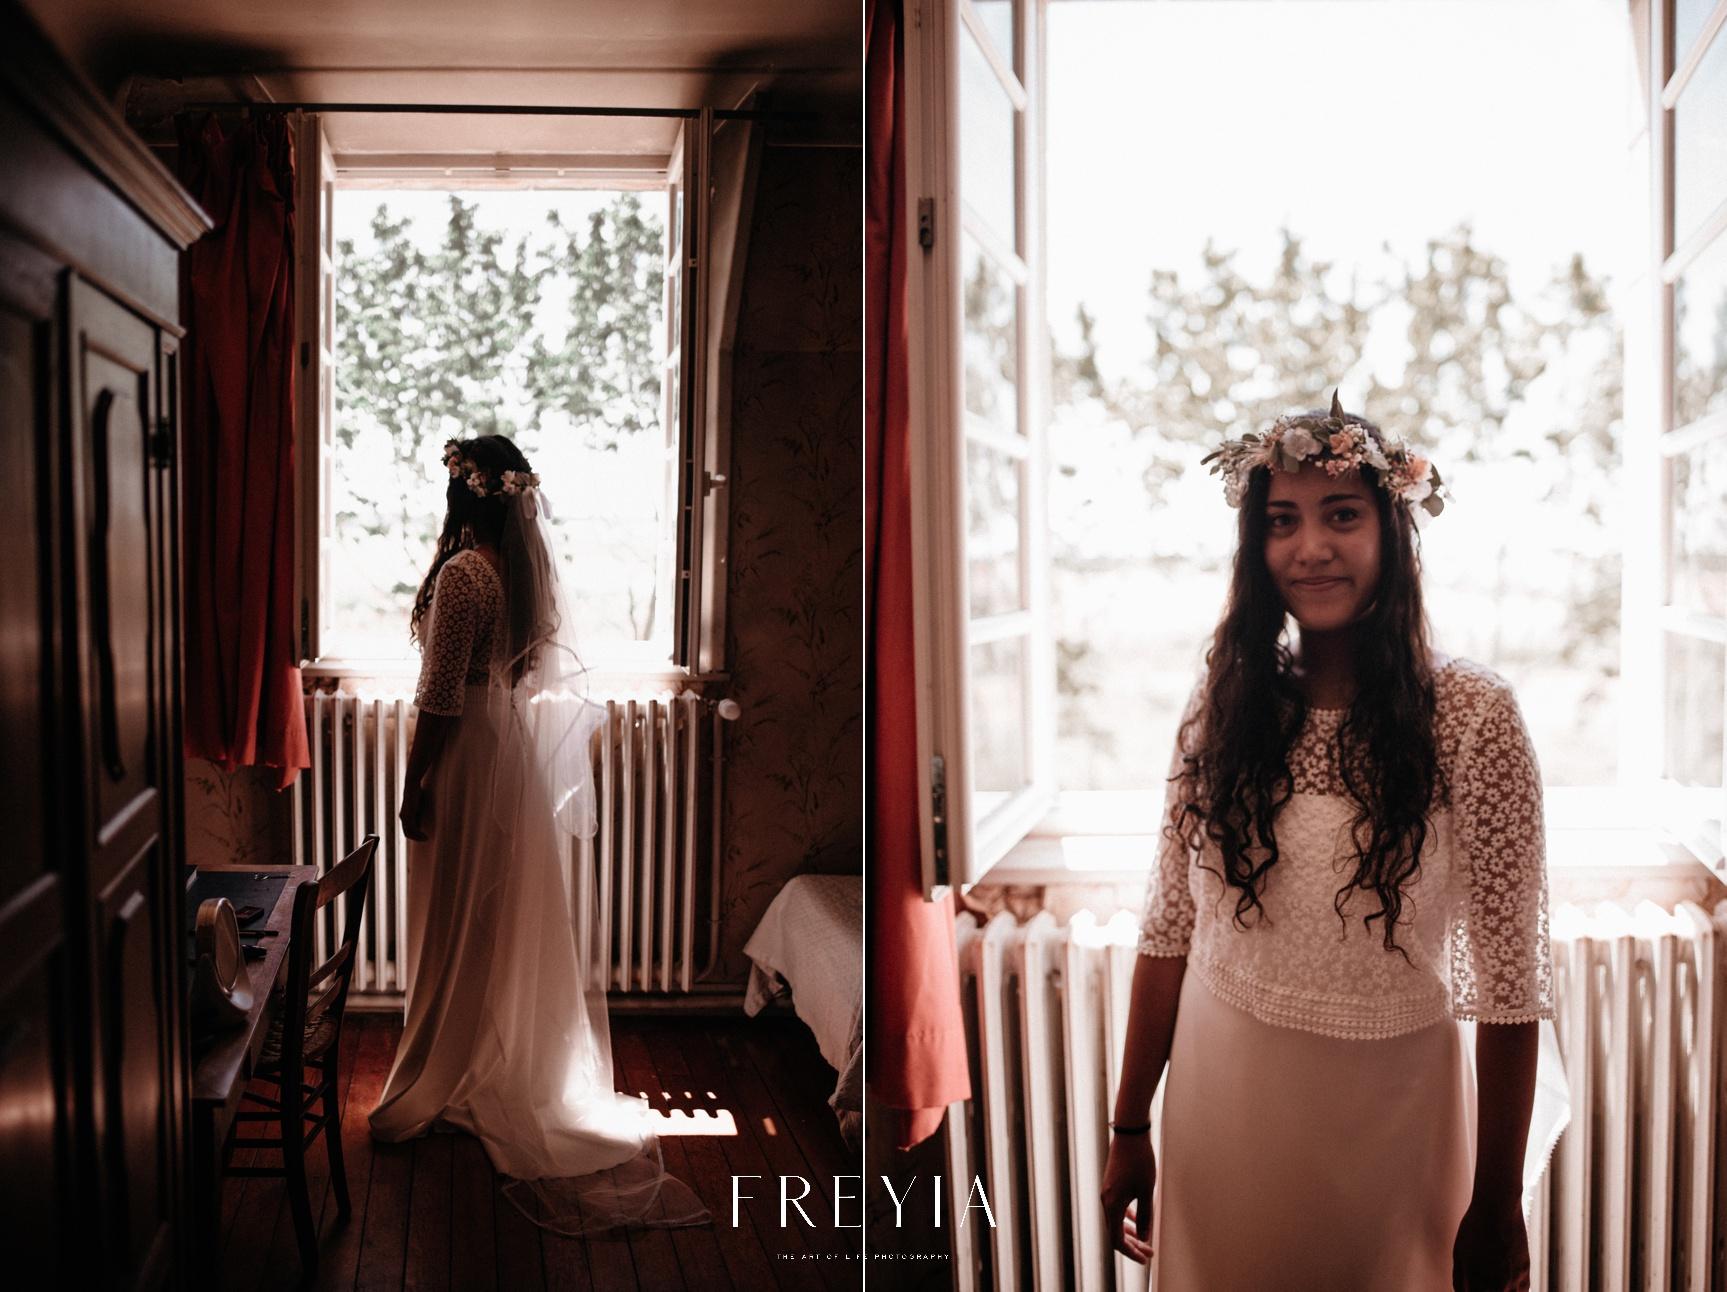 R + T |  mariage reportage alternatif moody intime minimaliste vintage naturel boho boheme |  PHOTOGRAPHE mariage PARIS france destination  | FREYIA photography_-122.jpg